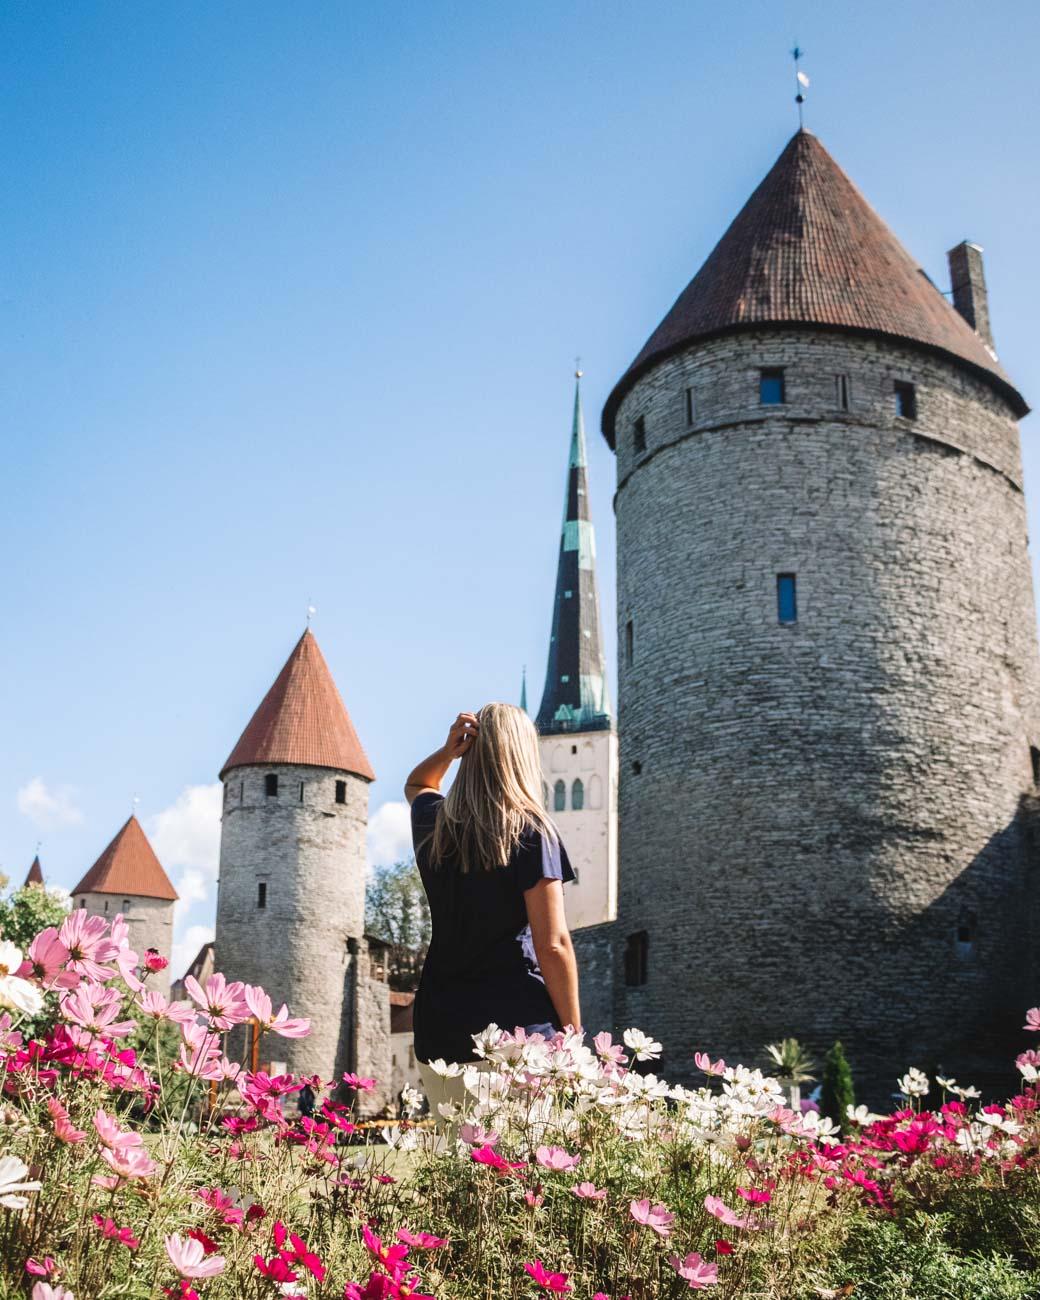 Danish Kings Garden - Best things to do in Tallinn